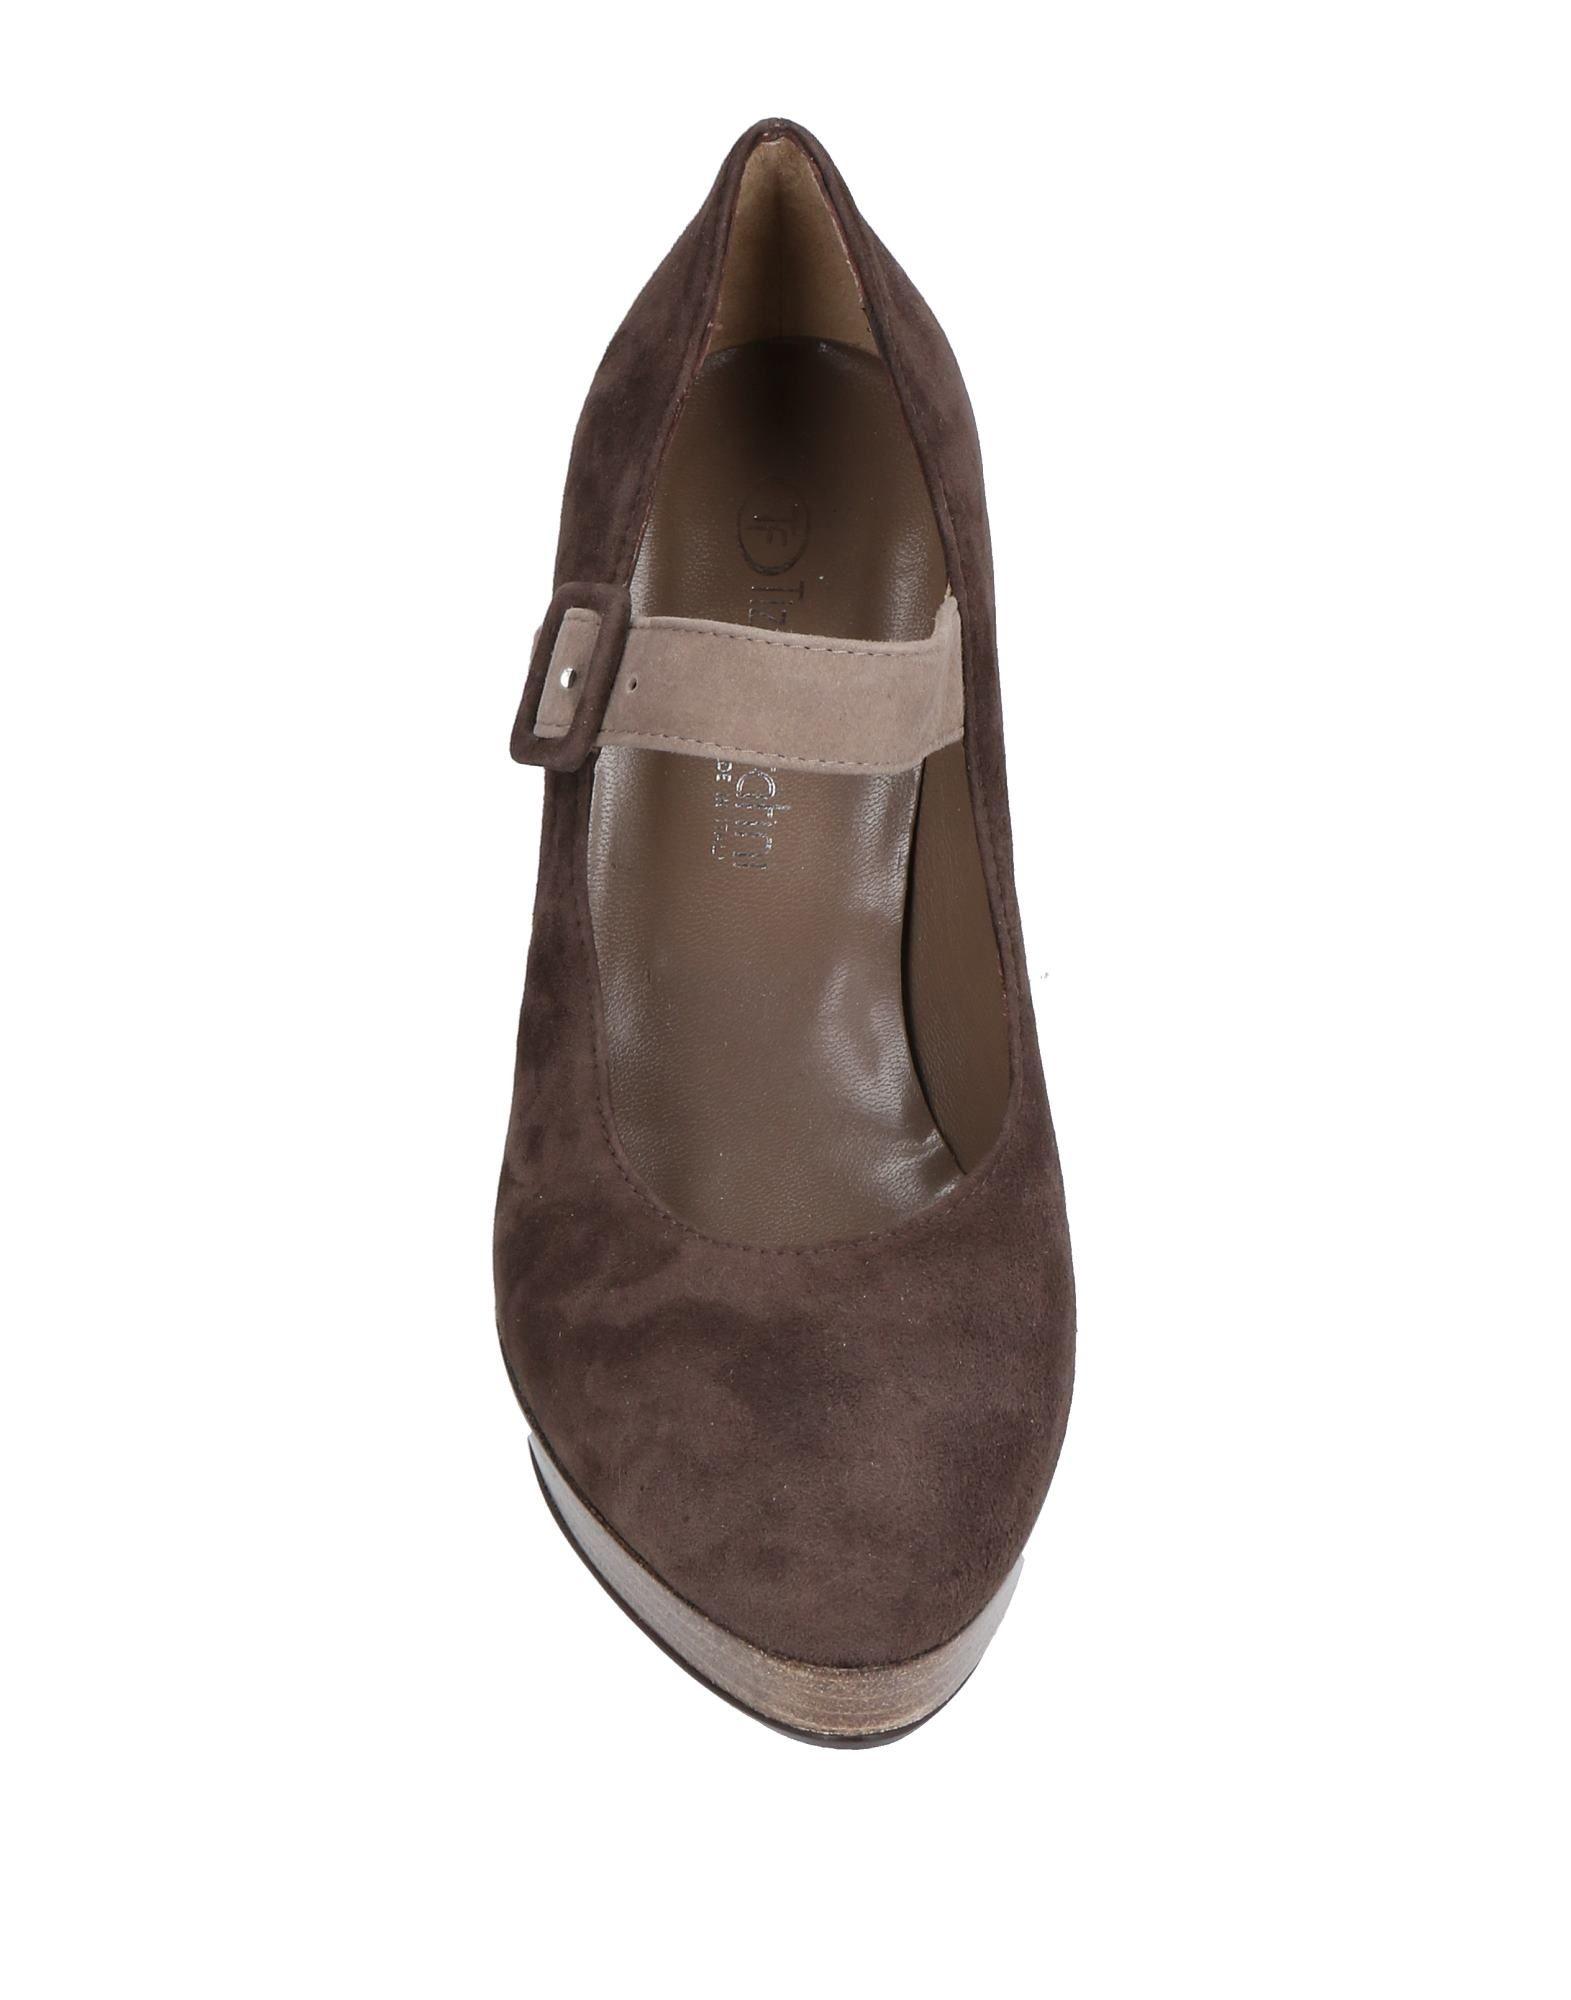 Tiziano Fratini Gute Pumps Damen  11502130GA Gute Fratini Qualität beliebte Schuhe f32cb3